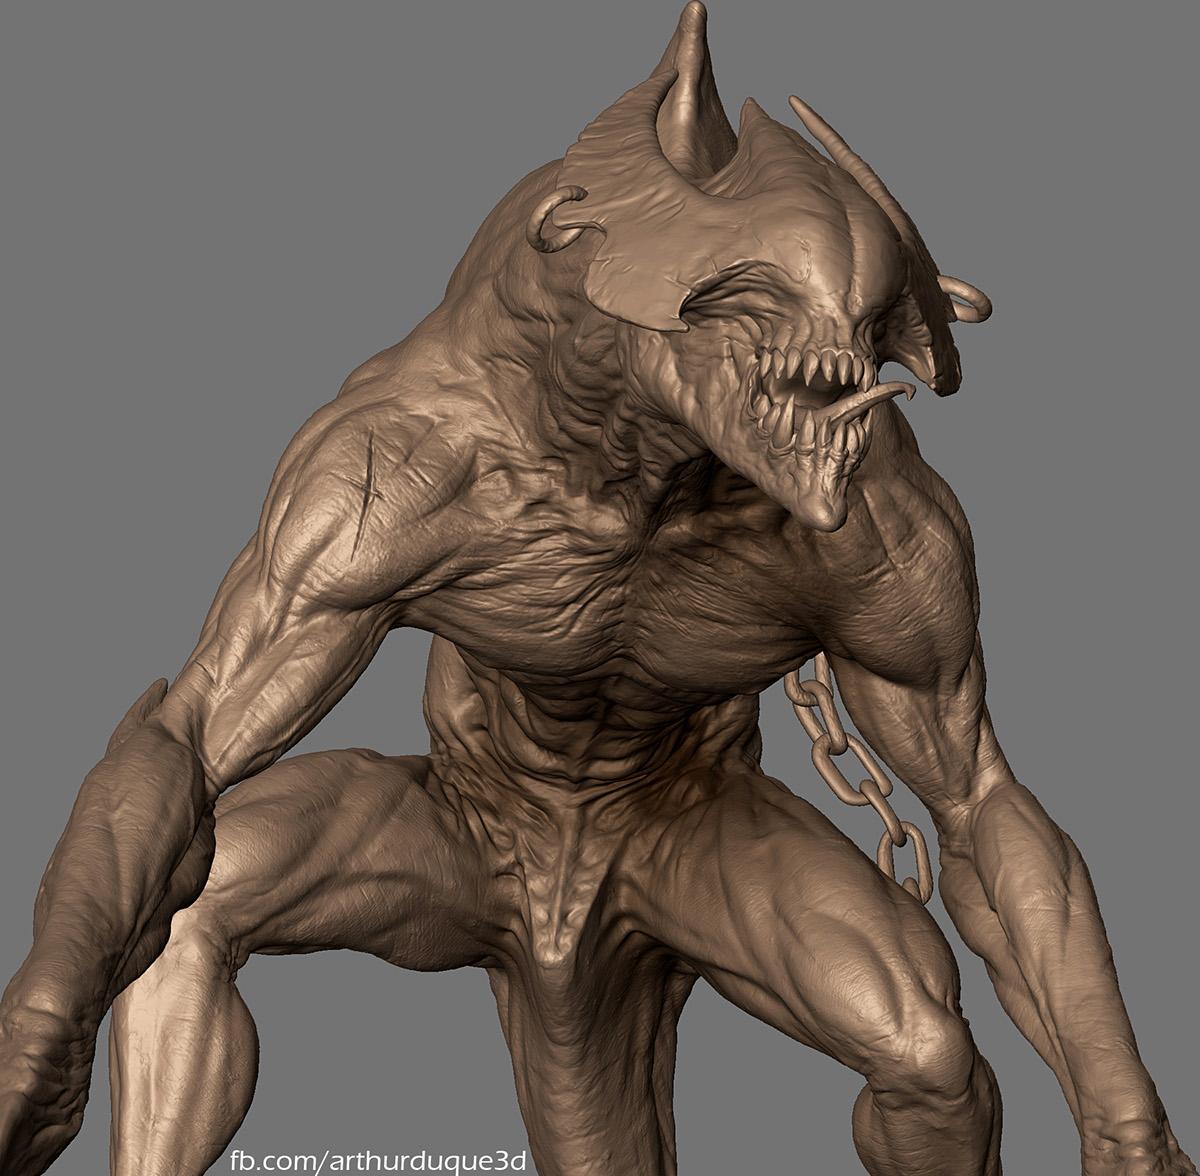 Character Design Jobs Australia : Demon soldier by arthur duque on behance